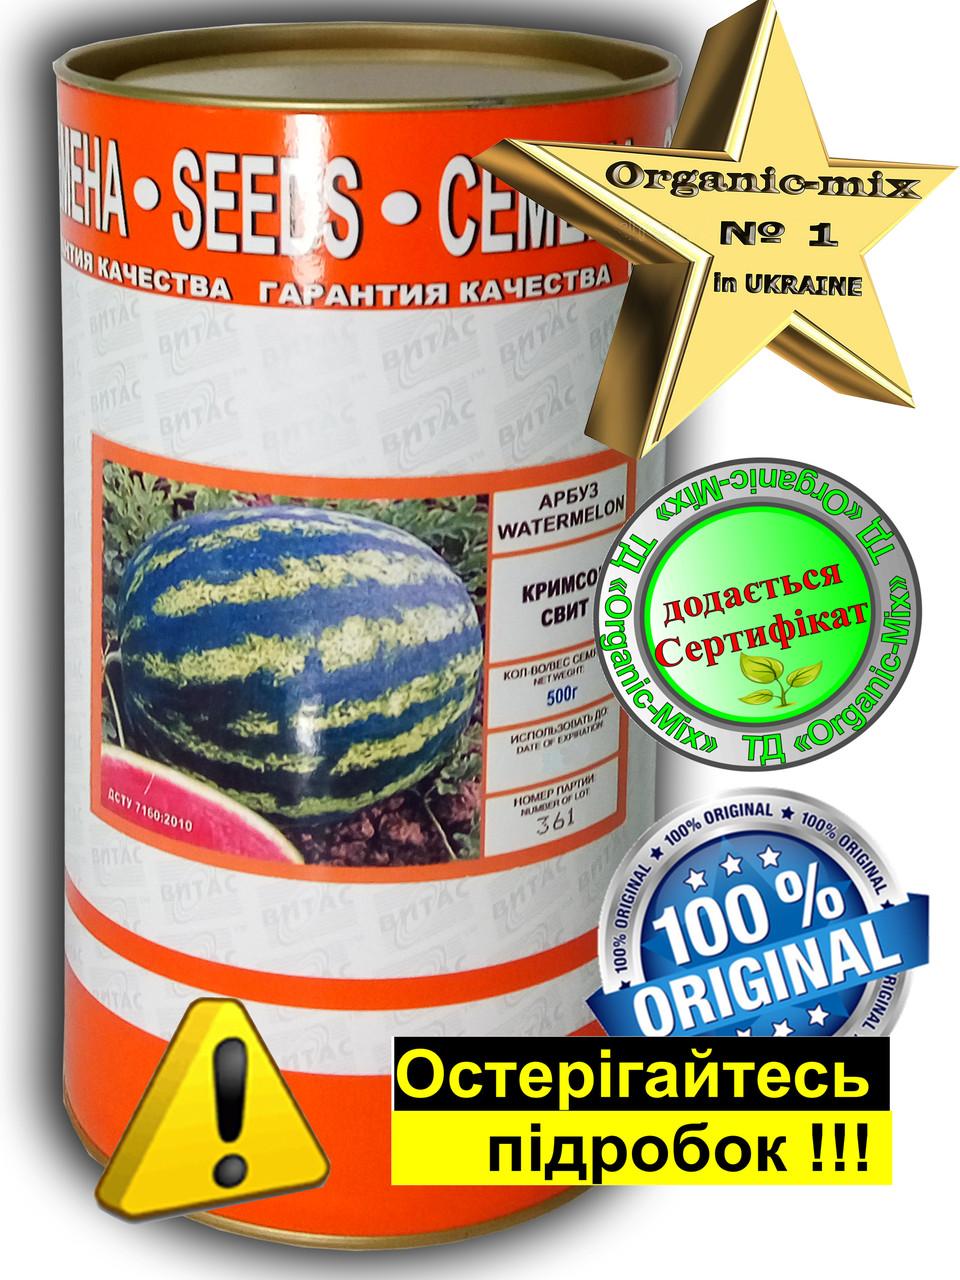 Арбуз Кримсон Свит, проф. семена ТМ Vitas, 500 грамм банка, обработанные Metalaxyl-M